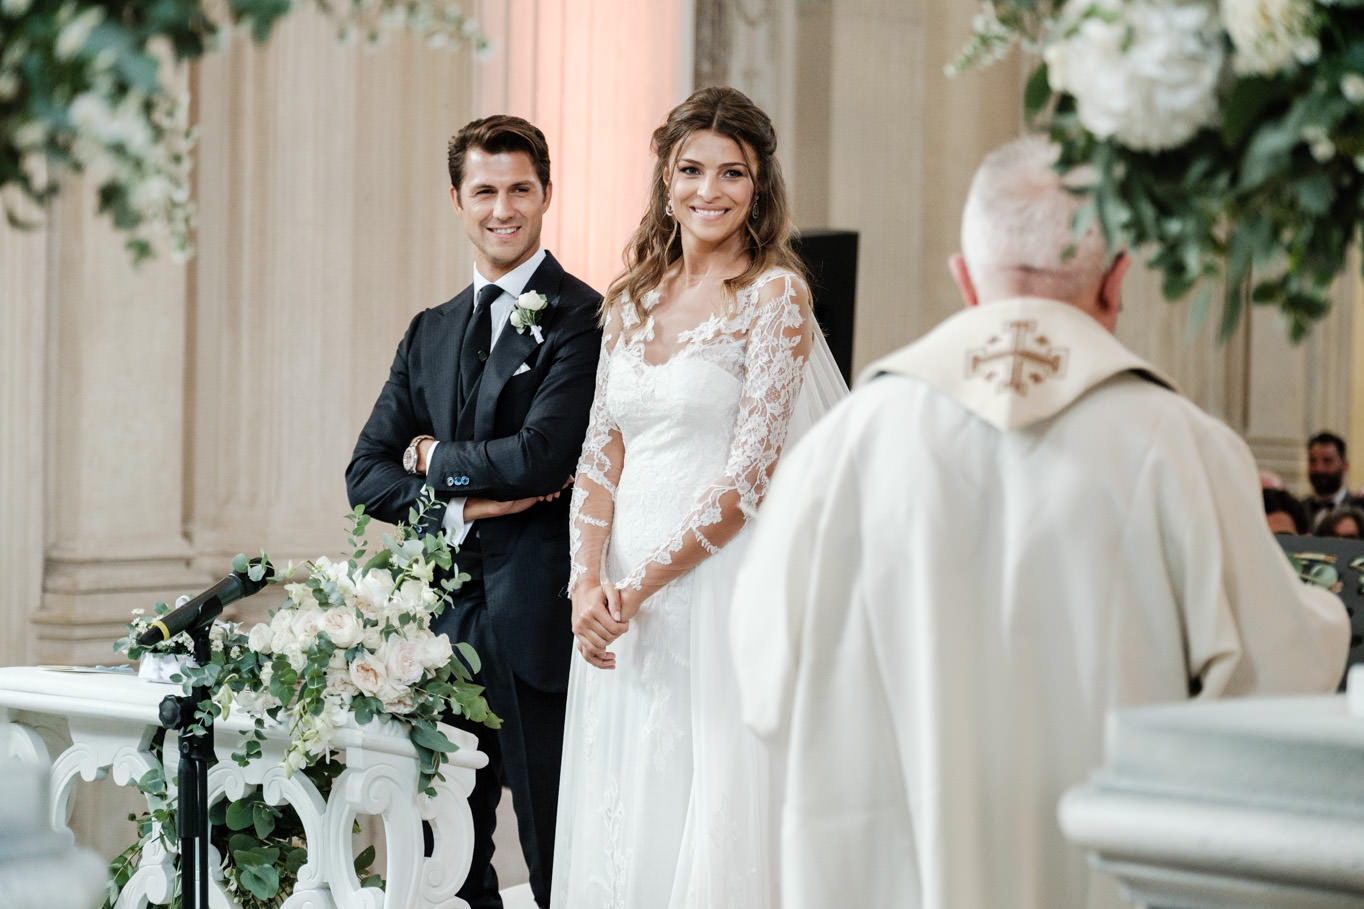 cristina chiabotto wedding ceremony with priest